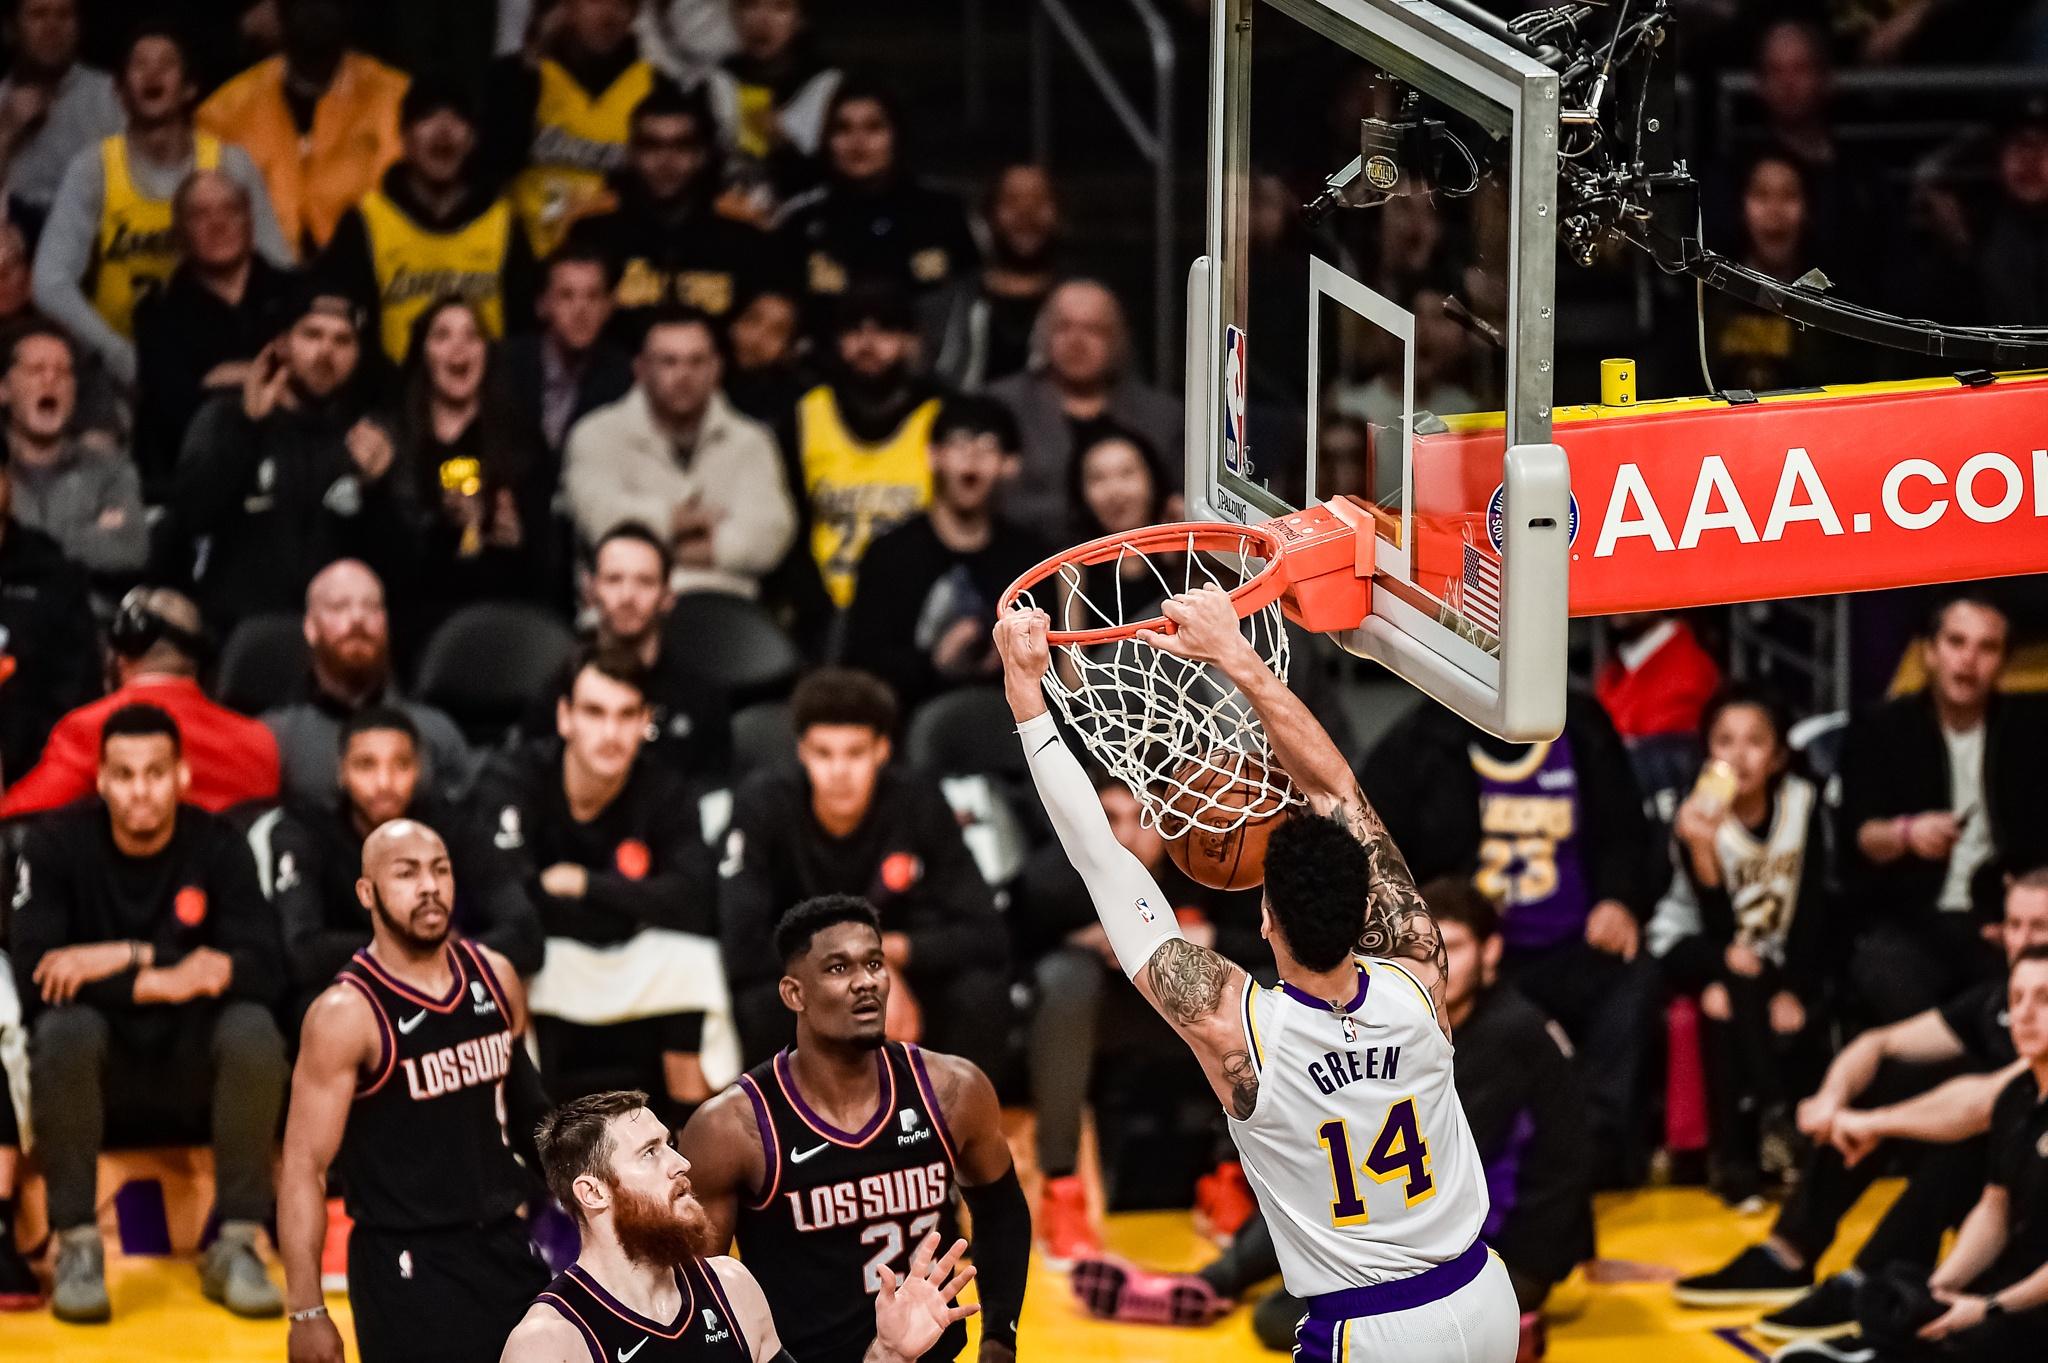 Los Angeles Lakers guard Danny Green